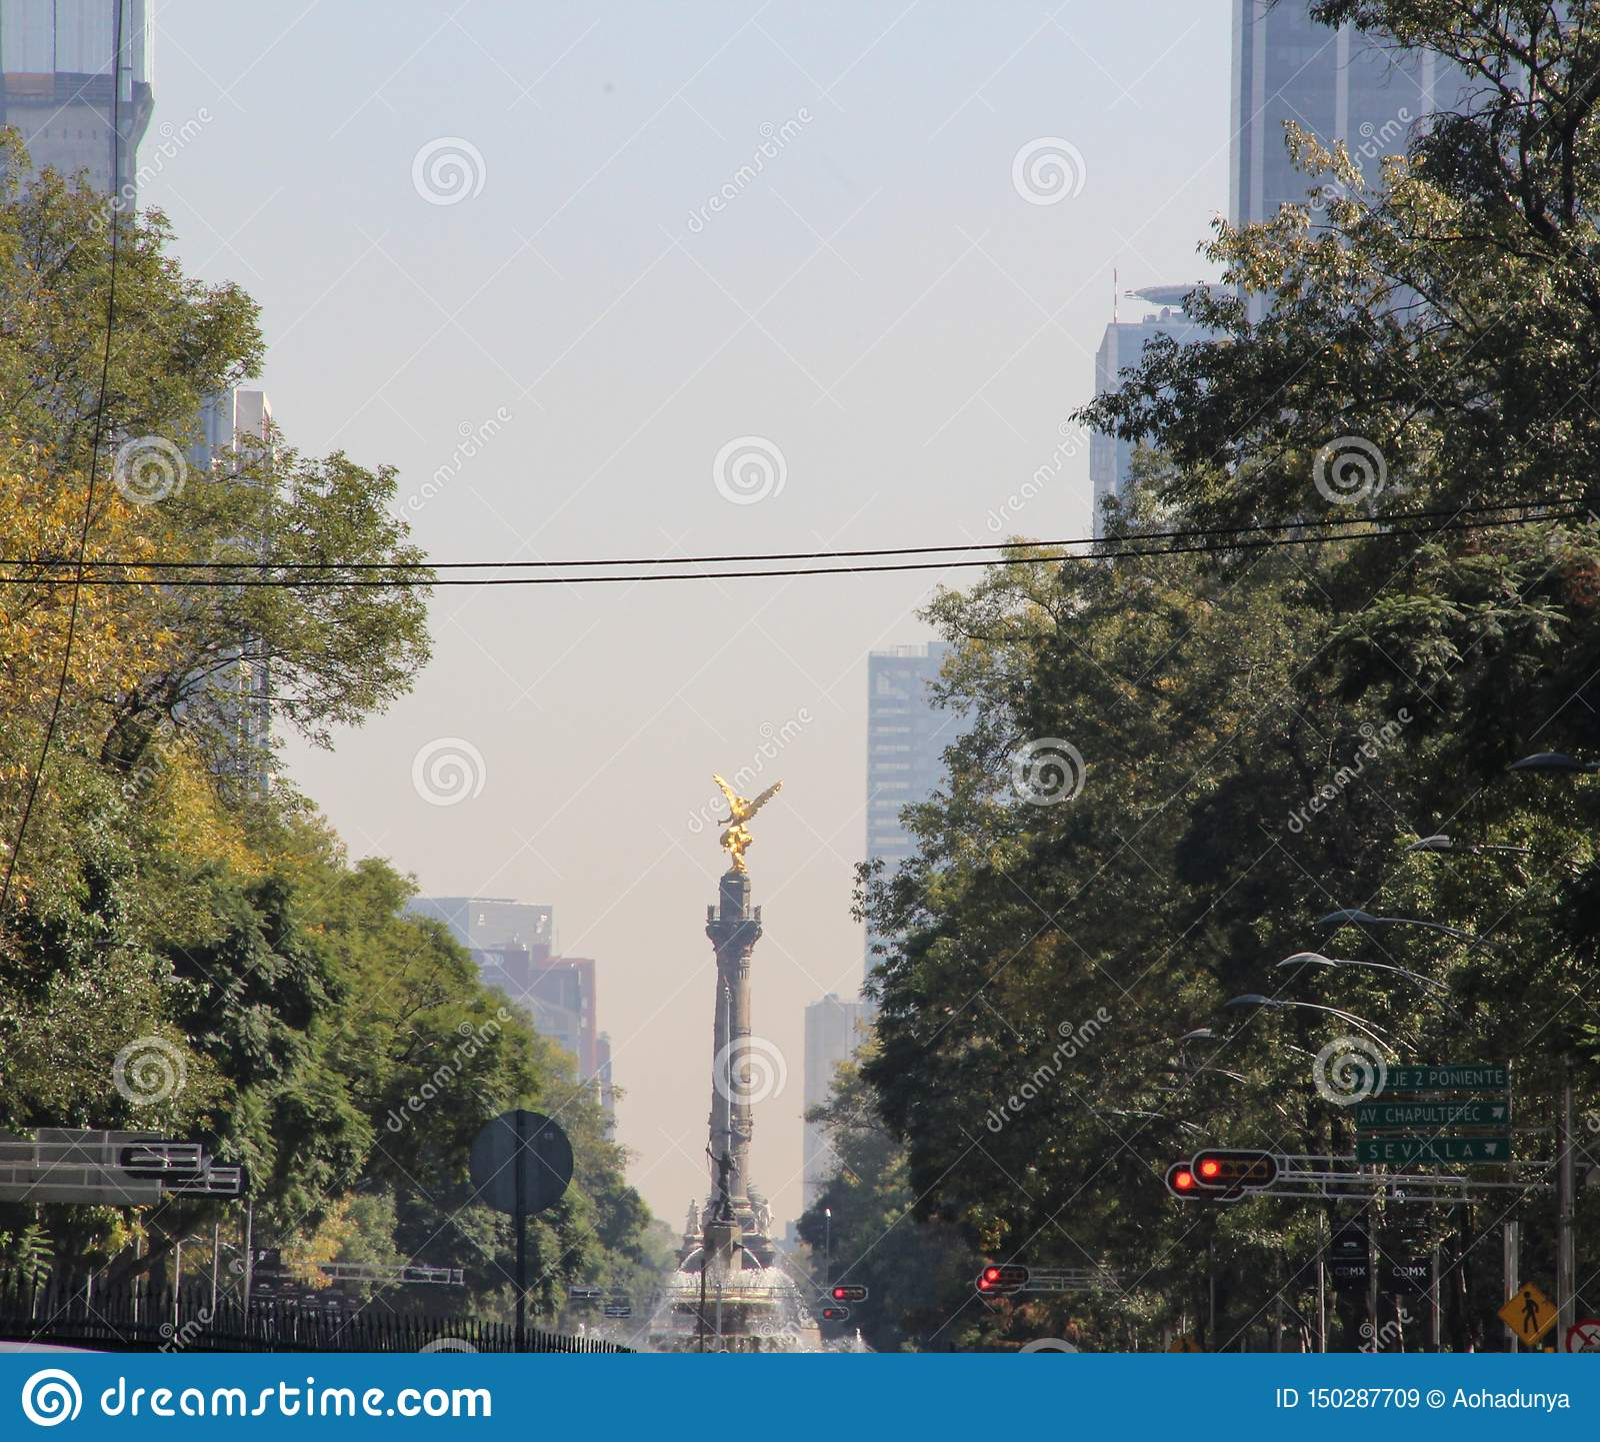 Engel van Onafhankelijkheid, Mexico-City, Mexico